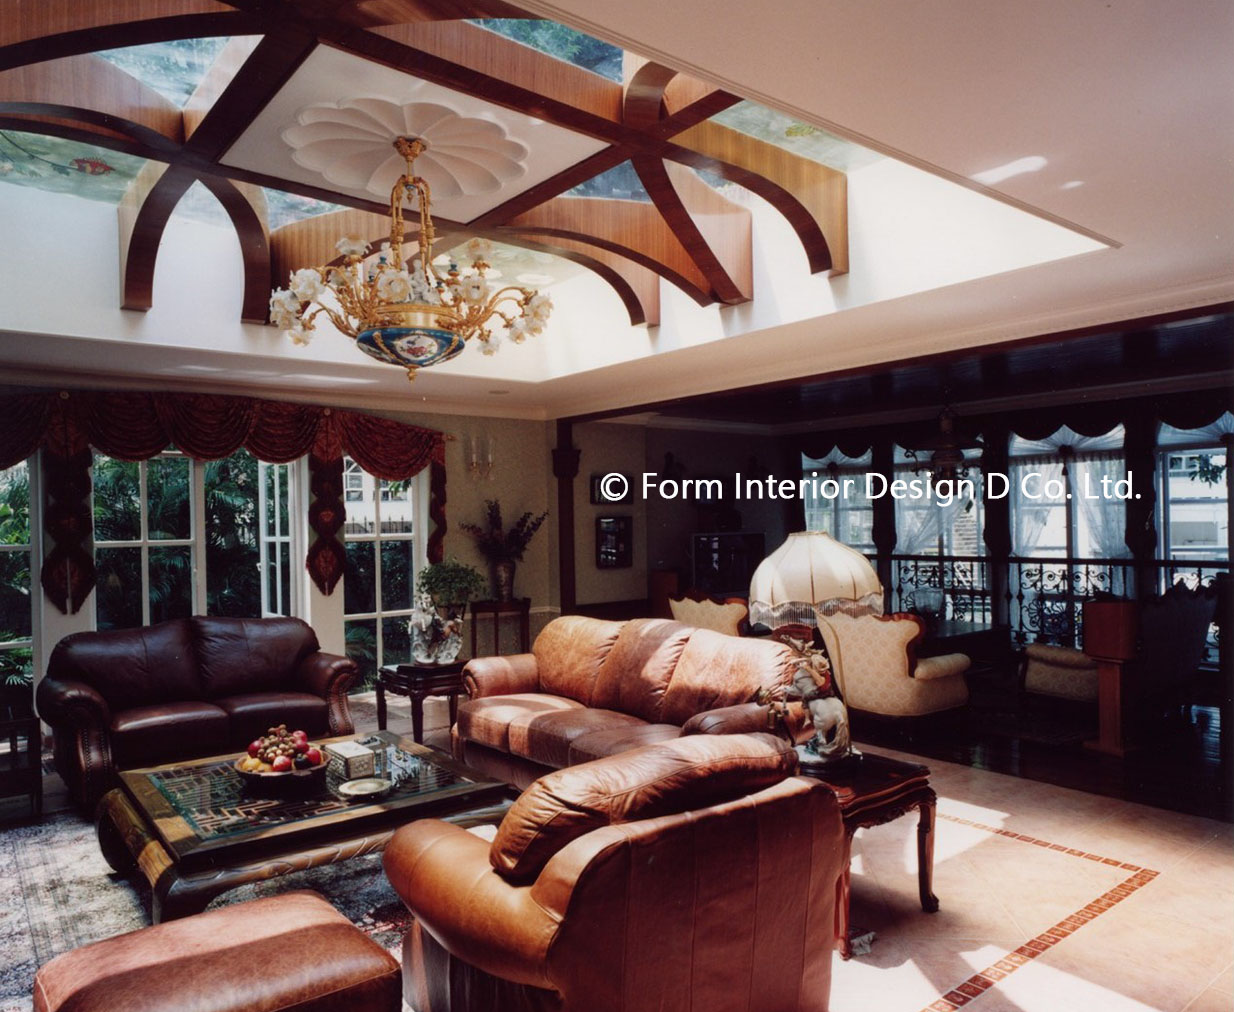 Form interior design form interior - Form in interior design ...